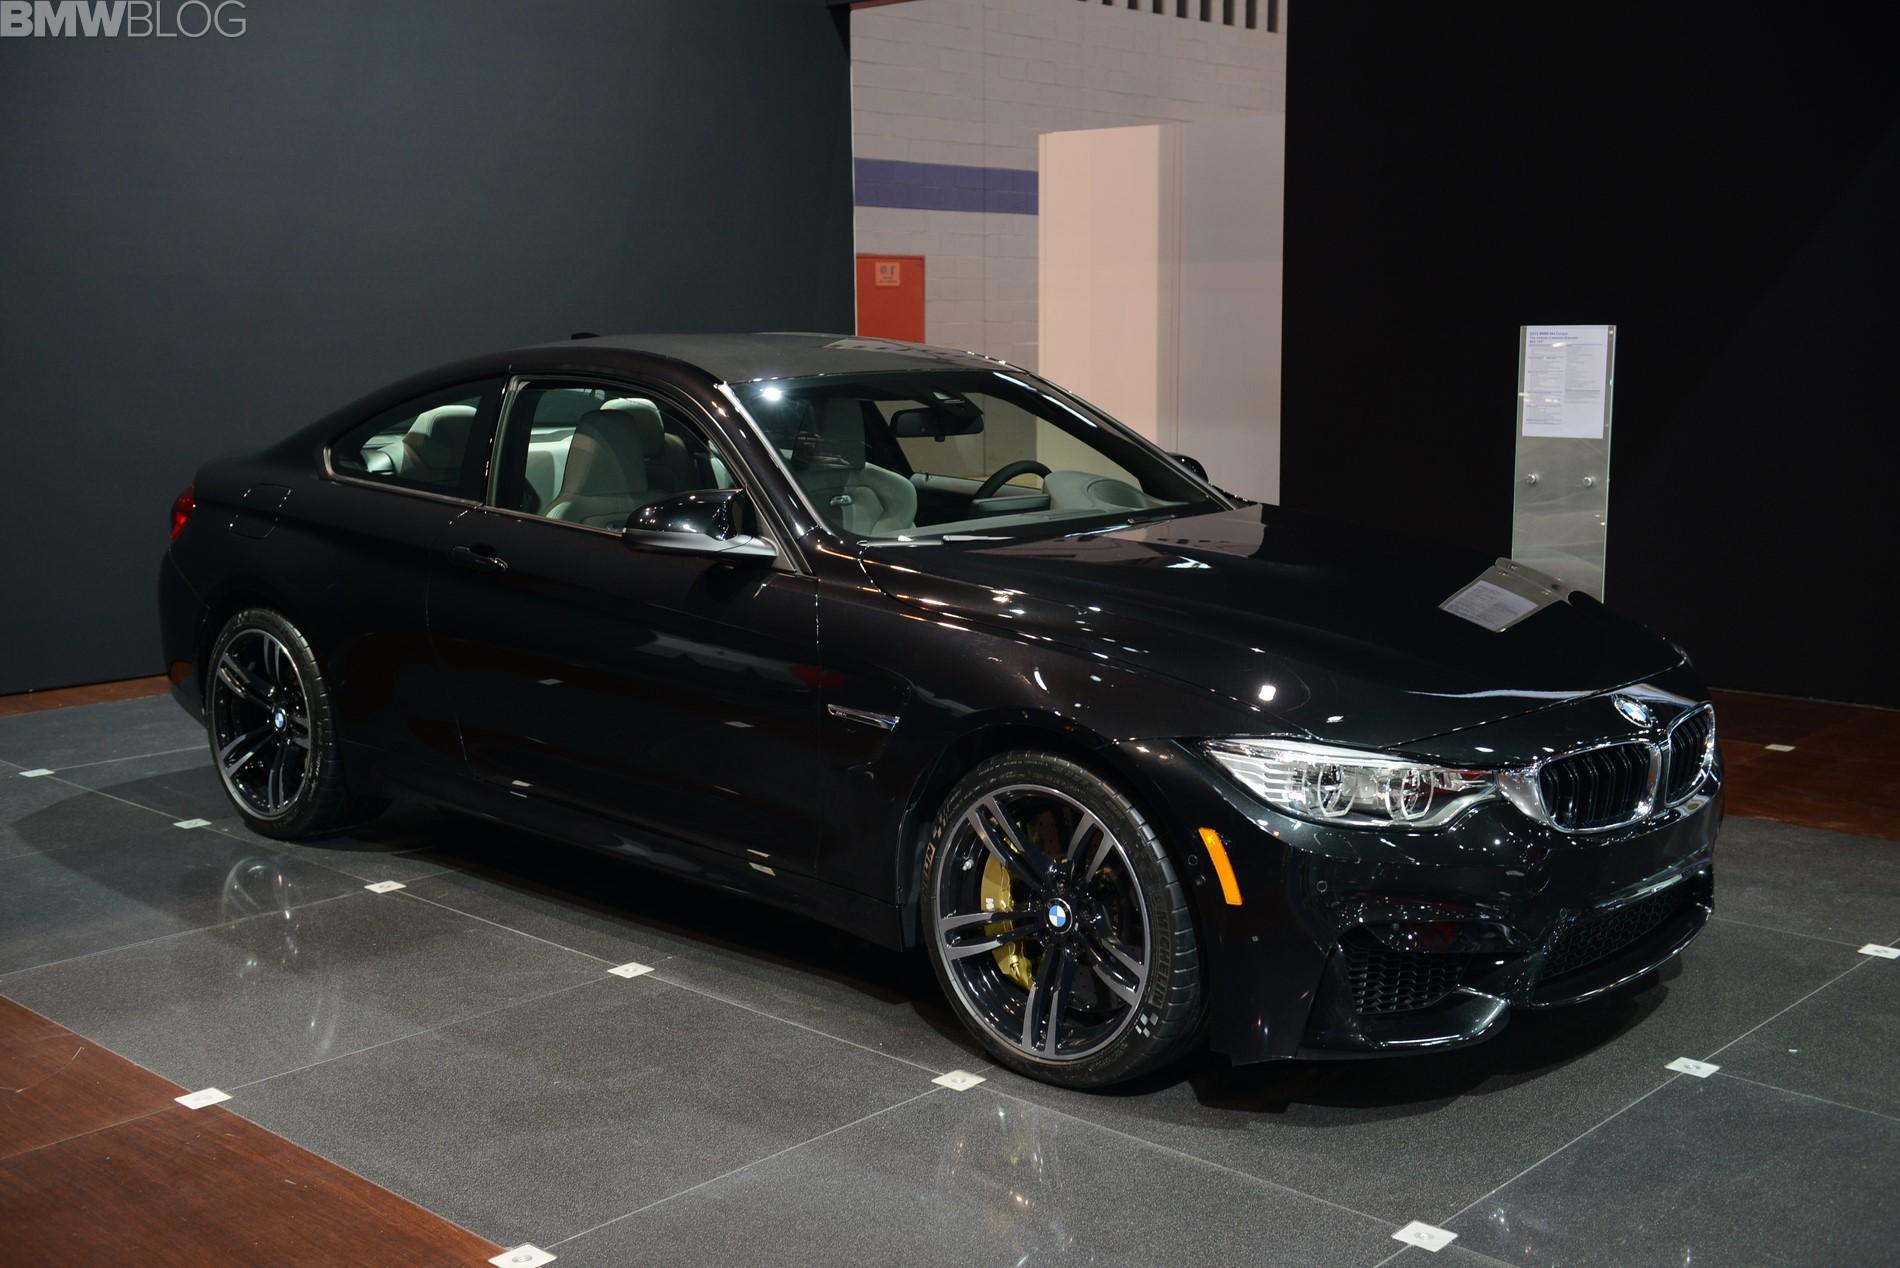 Chicago Auto Show 2014: BMW M4 Coupé in Saphirschwarz ...